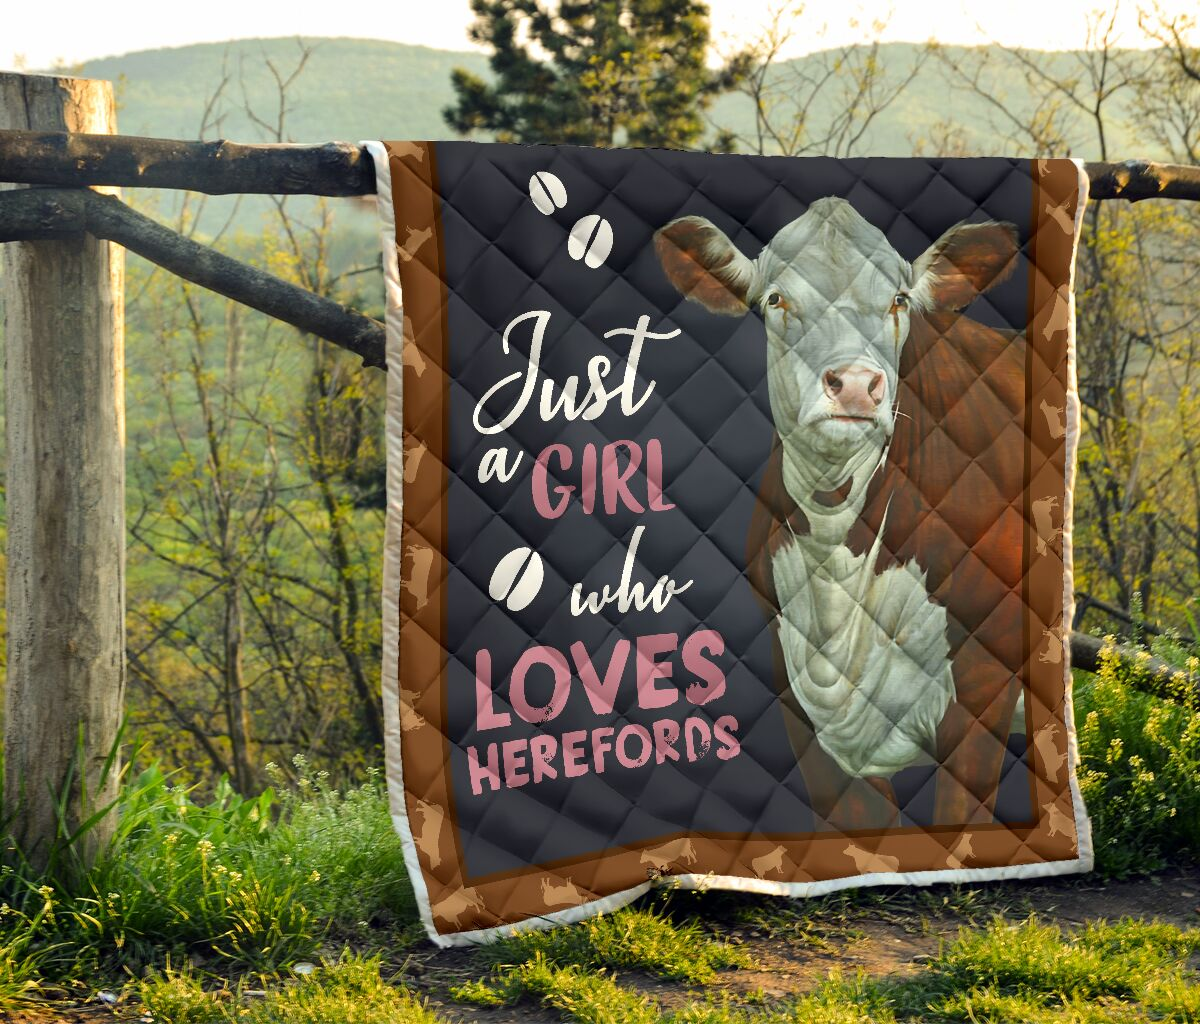 Just girl who loves herefords cow heifer quilt 2